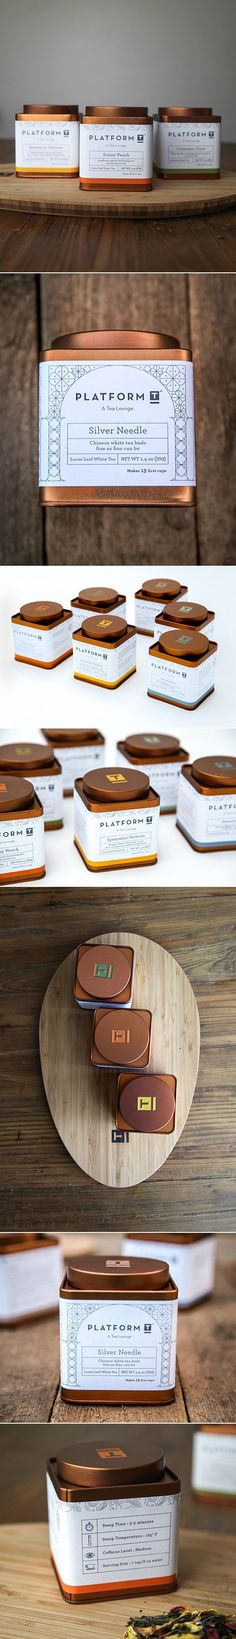 Lovely Package - Platform T Spices Packaging, Packaging Box, Candle Packaging, Coffee Packaging, Cosmetic Packaging, Brand Packaging, Design Poster, Label Design, Branding Design